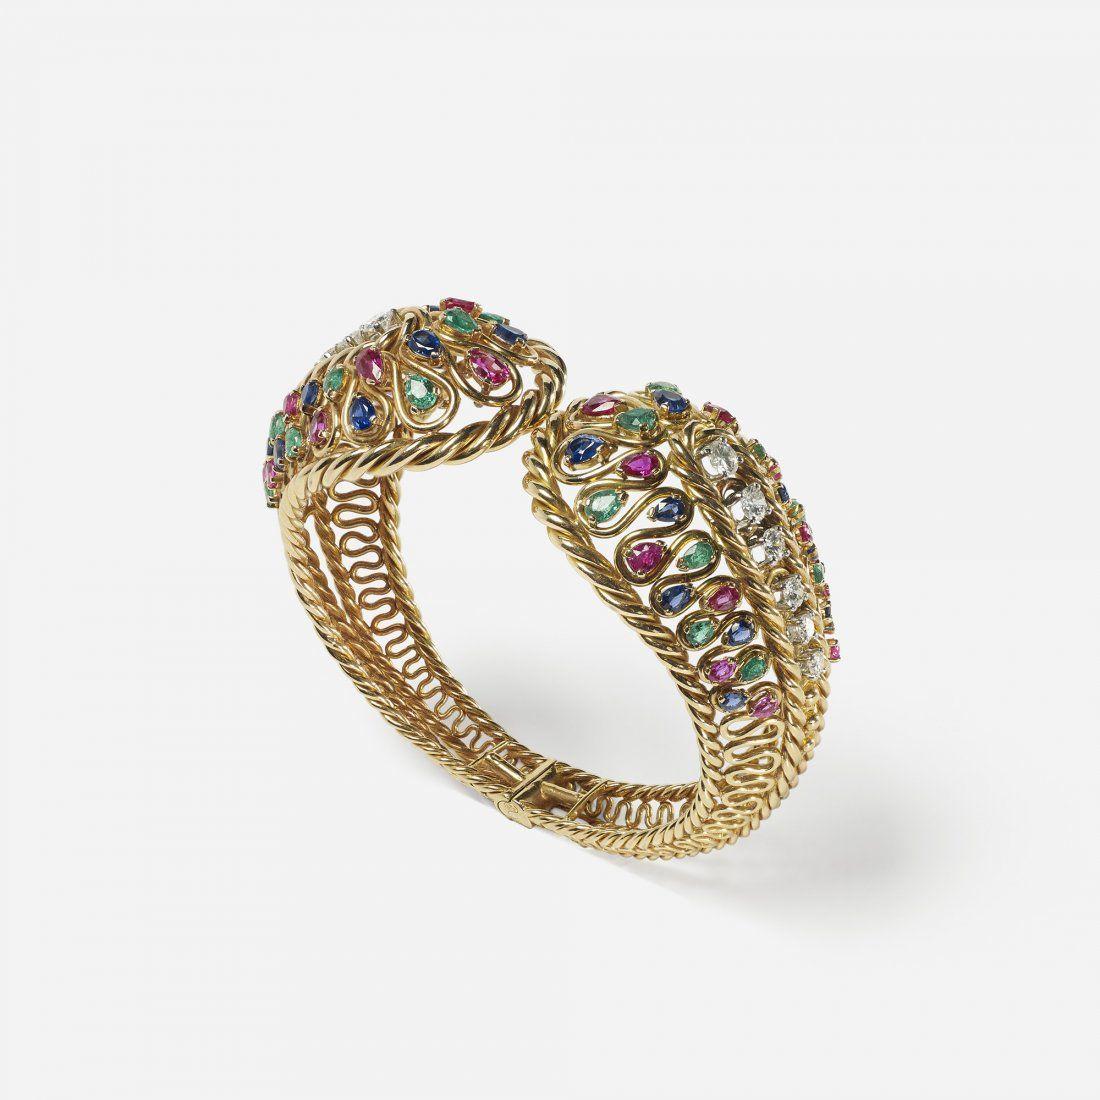 Gubelin ruby, emerald, sapphire & diamond bracelet